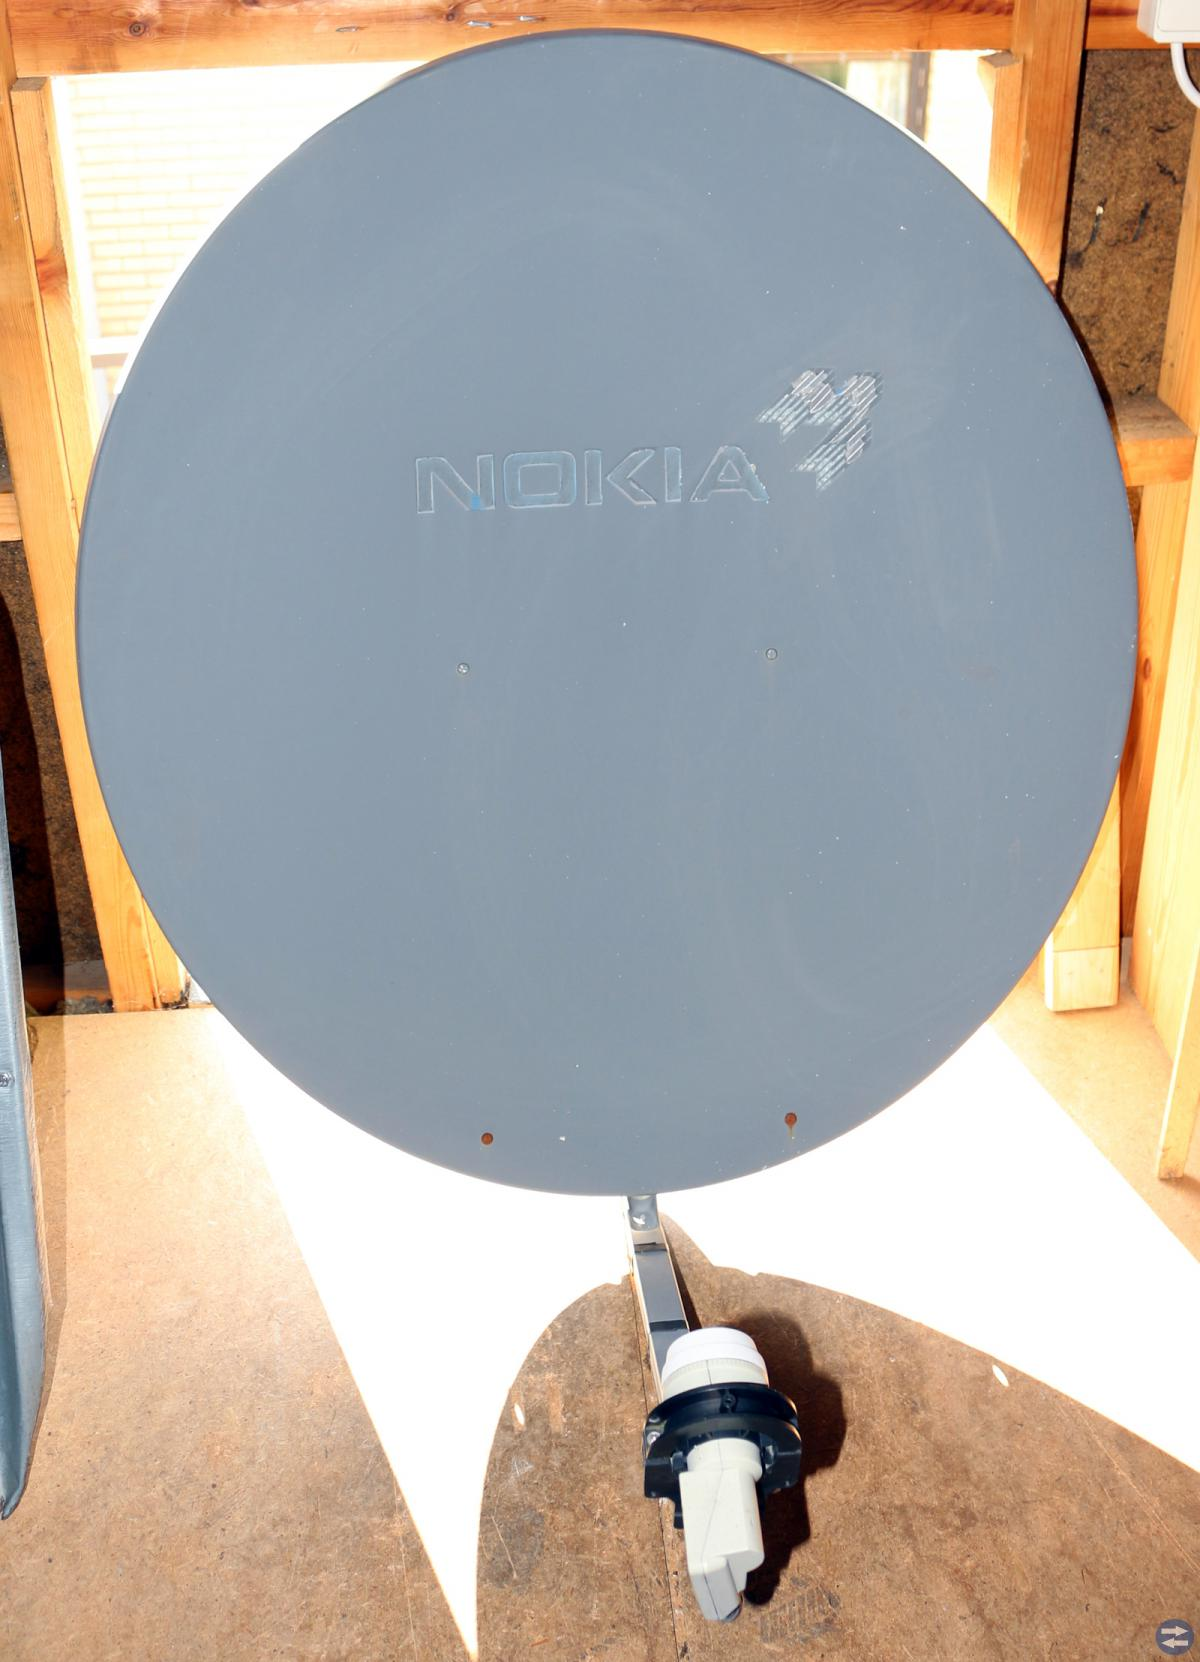 1 Parabol, 3st LNB, 6st Switchar, Nya antennfästen